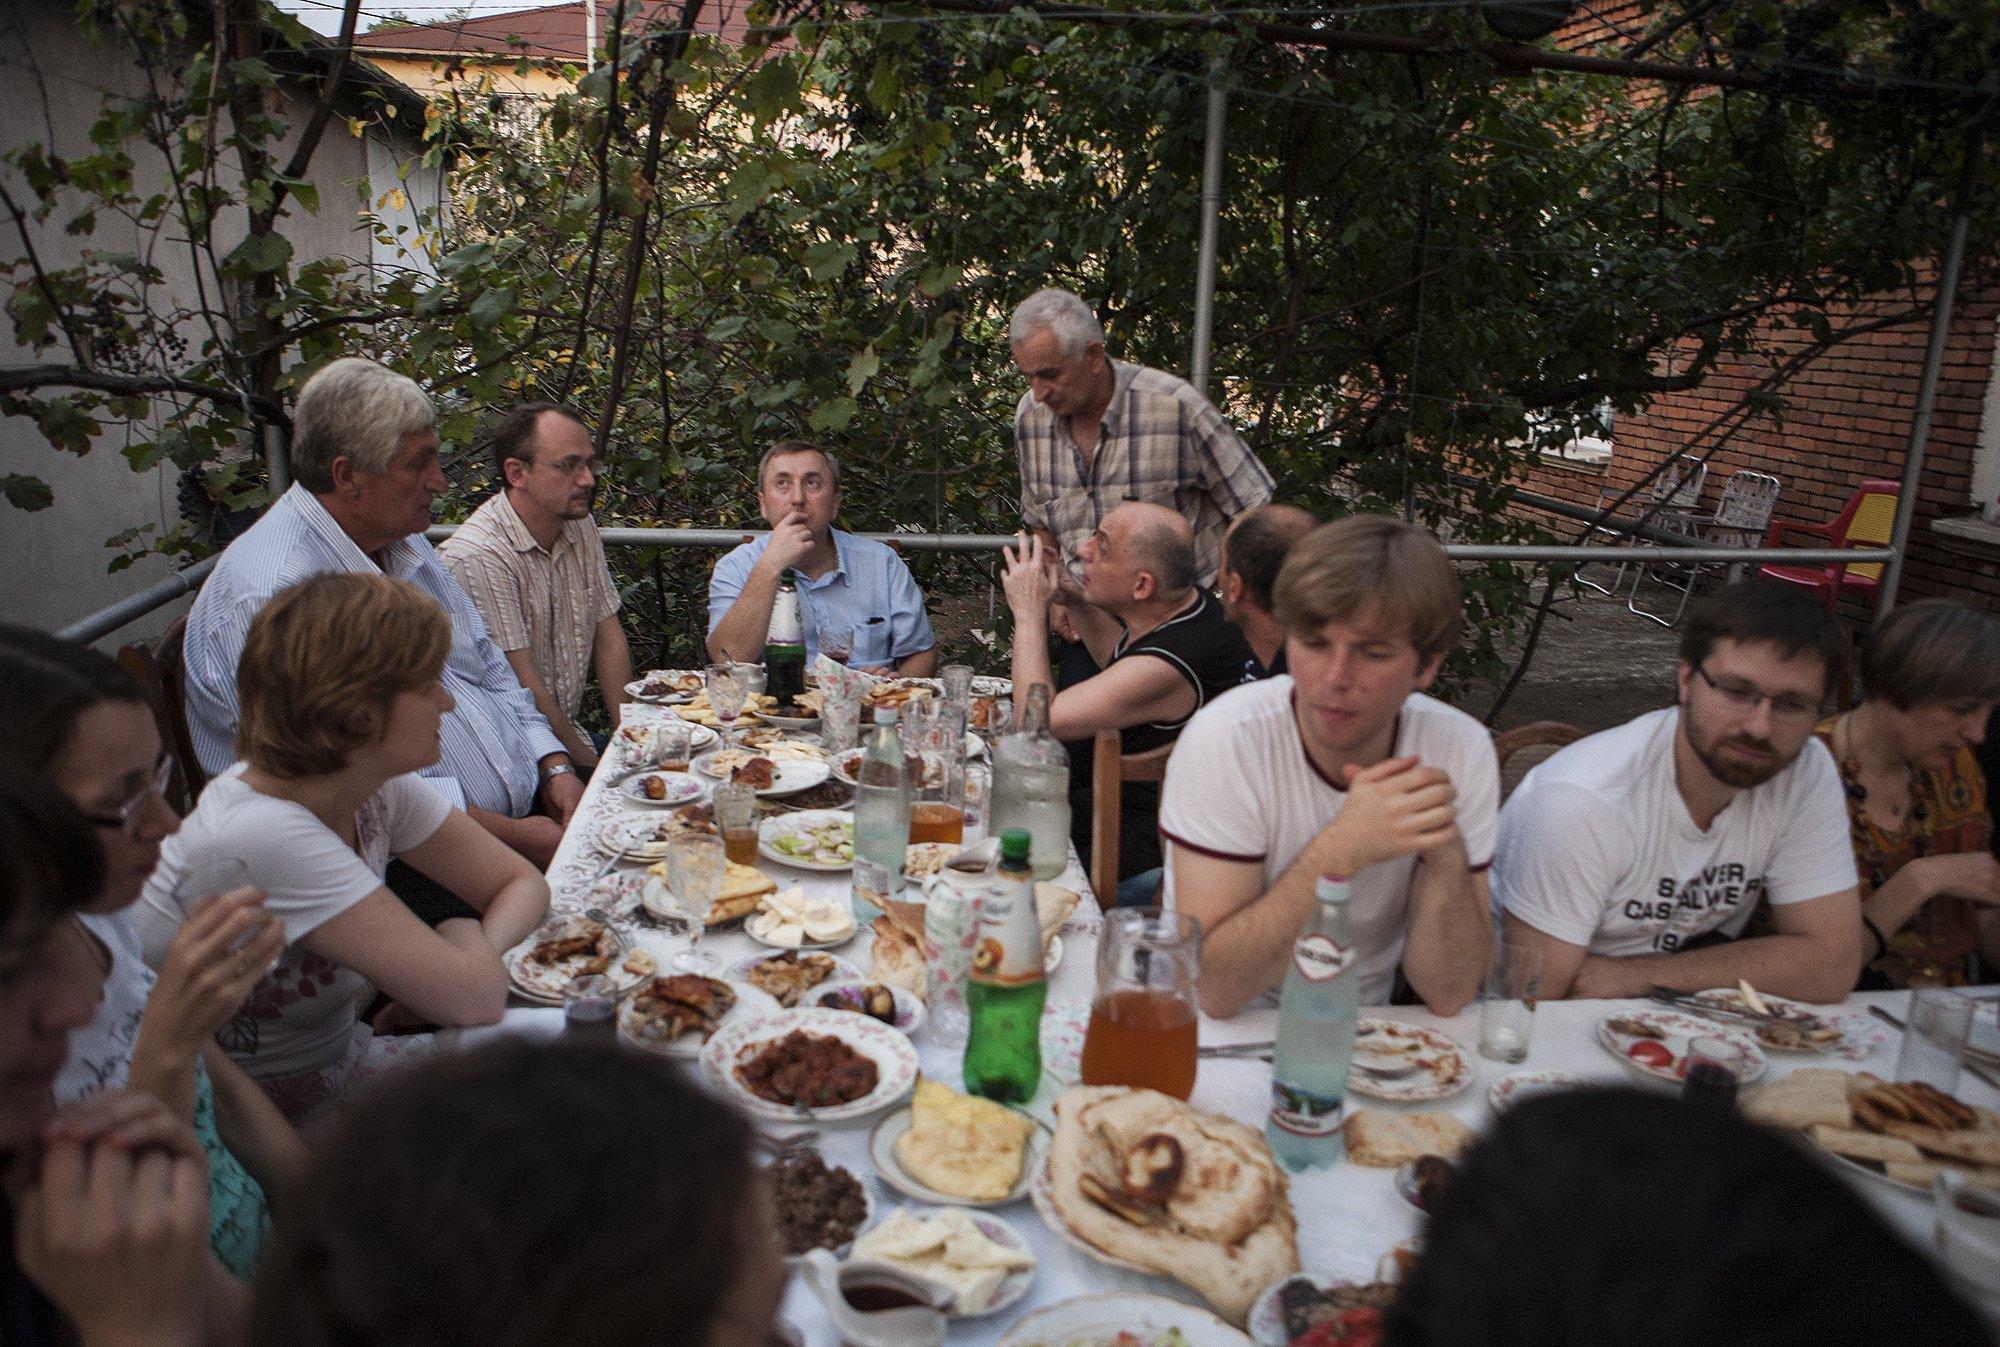 gruzinskij-stol Медиапроект s-t-o-l.com